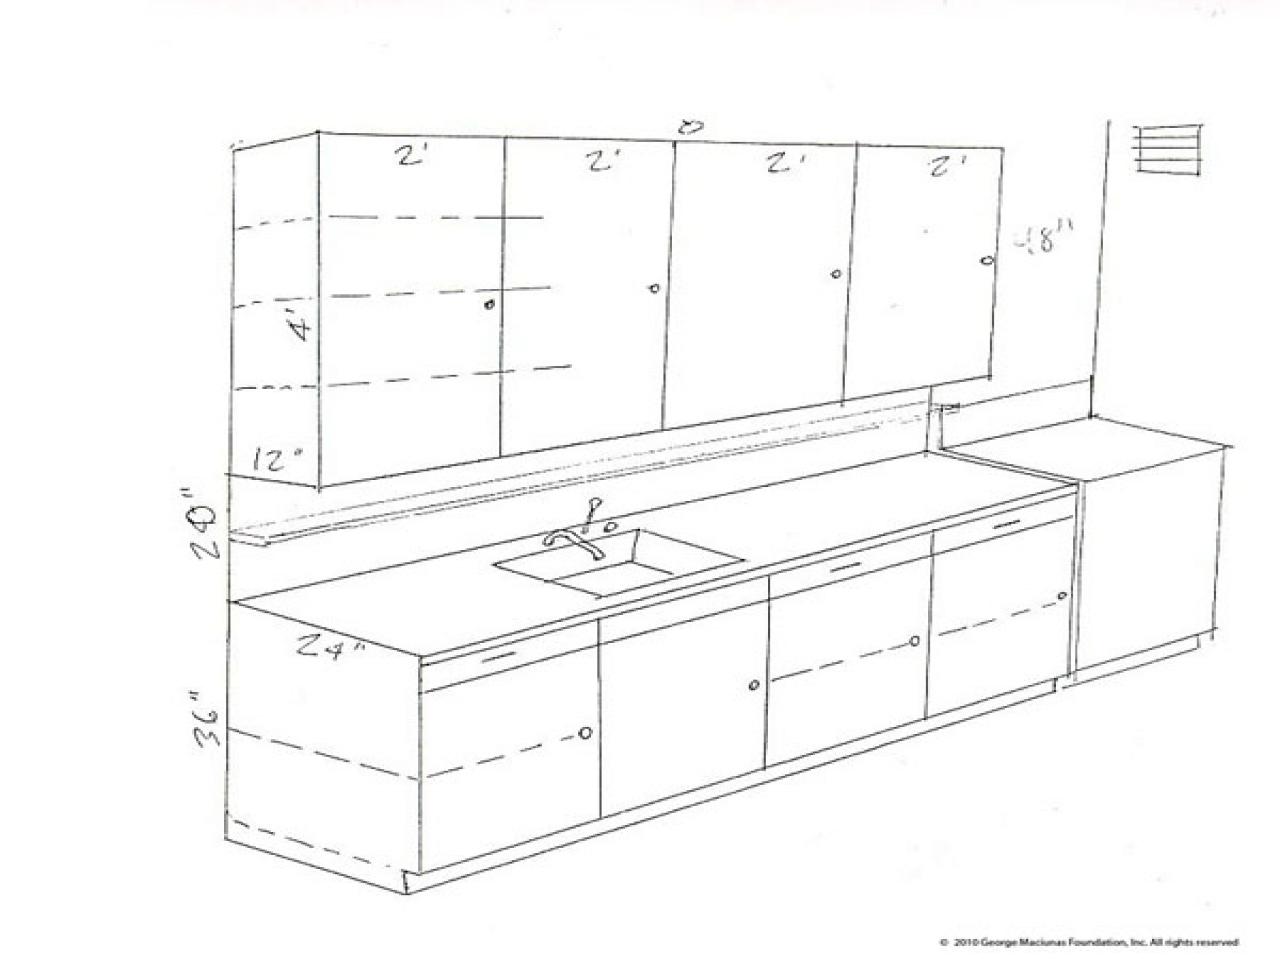 1280x960 75 Types Natty Kitchen Cabinets Sizes Full Size Stunning Cabinet